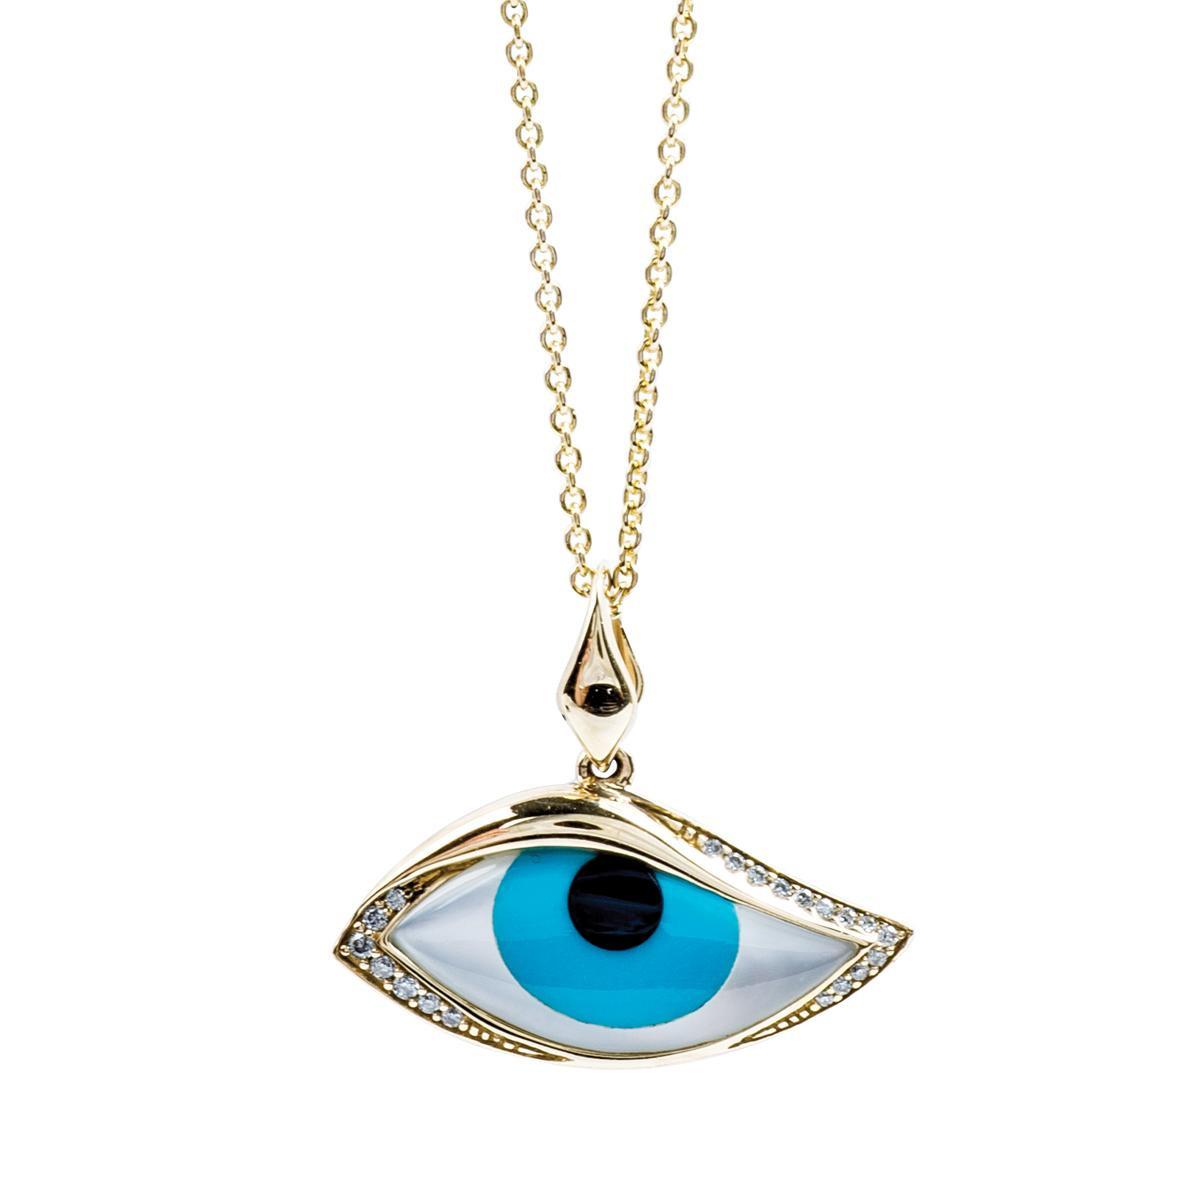 Vintage Kabana Evil Eye Turquoise Pendant